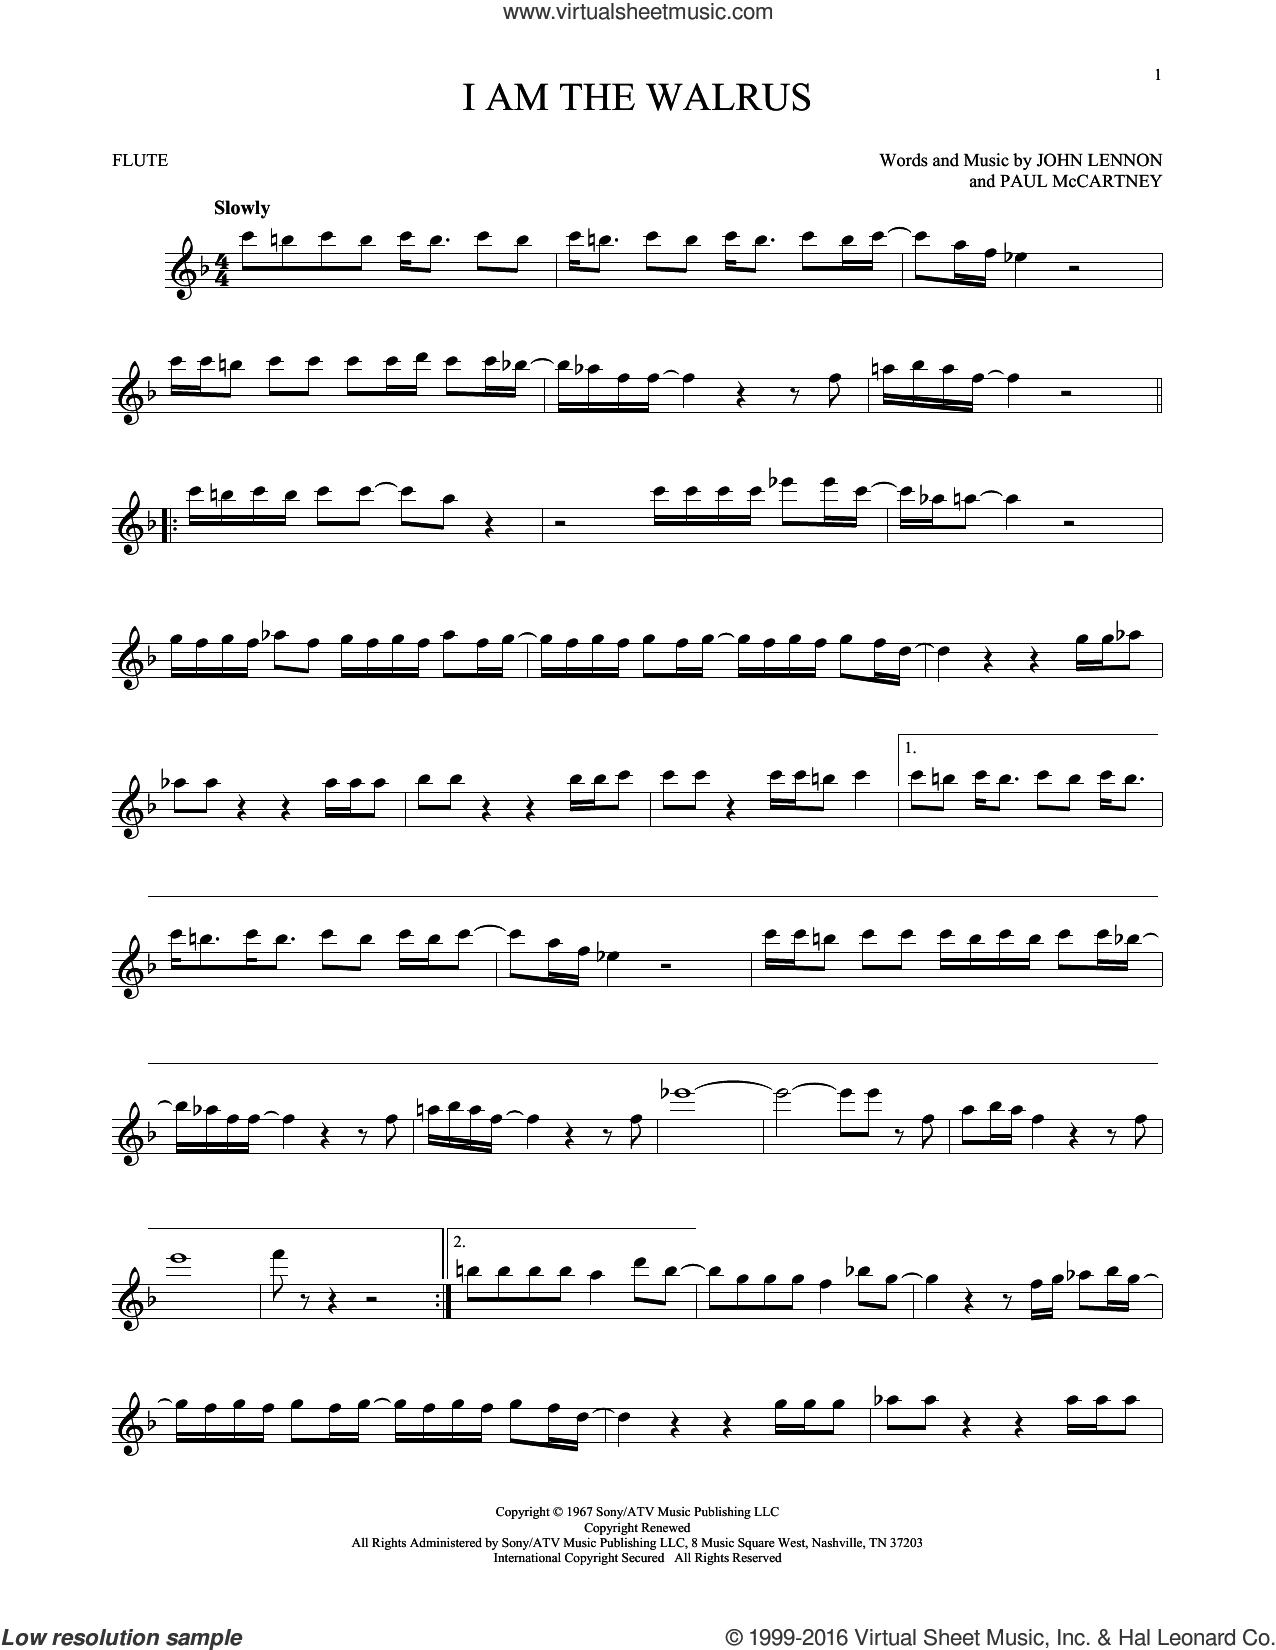 I Am The Walrus sheet music for flute solo by The Beatles, John Lennon and Paul McCartney, intermediate skill level